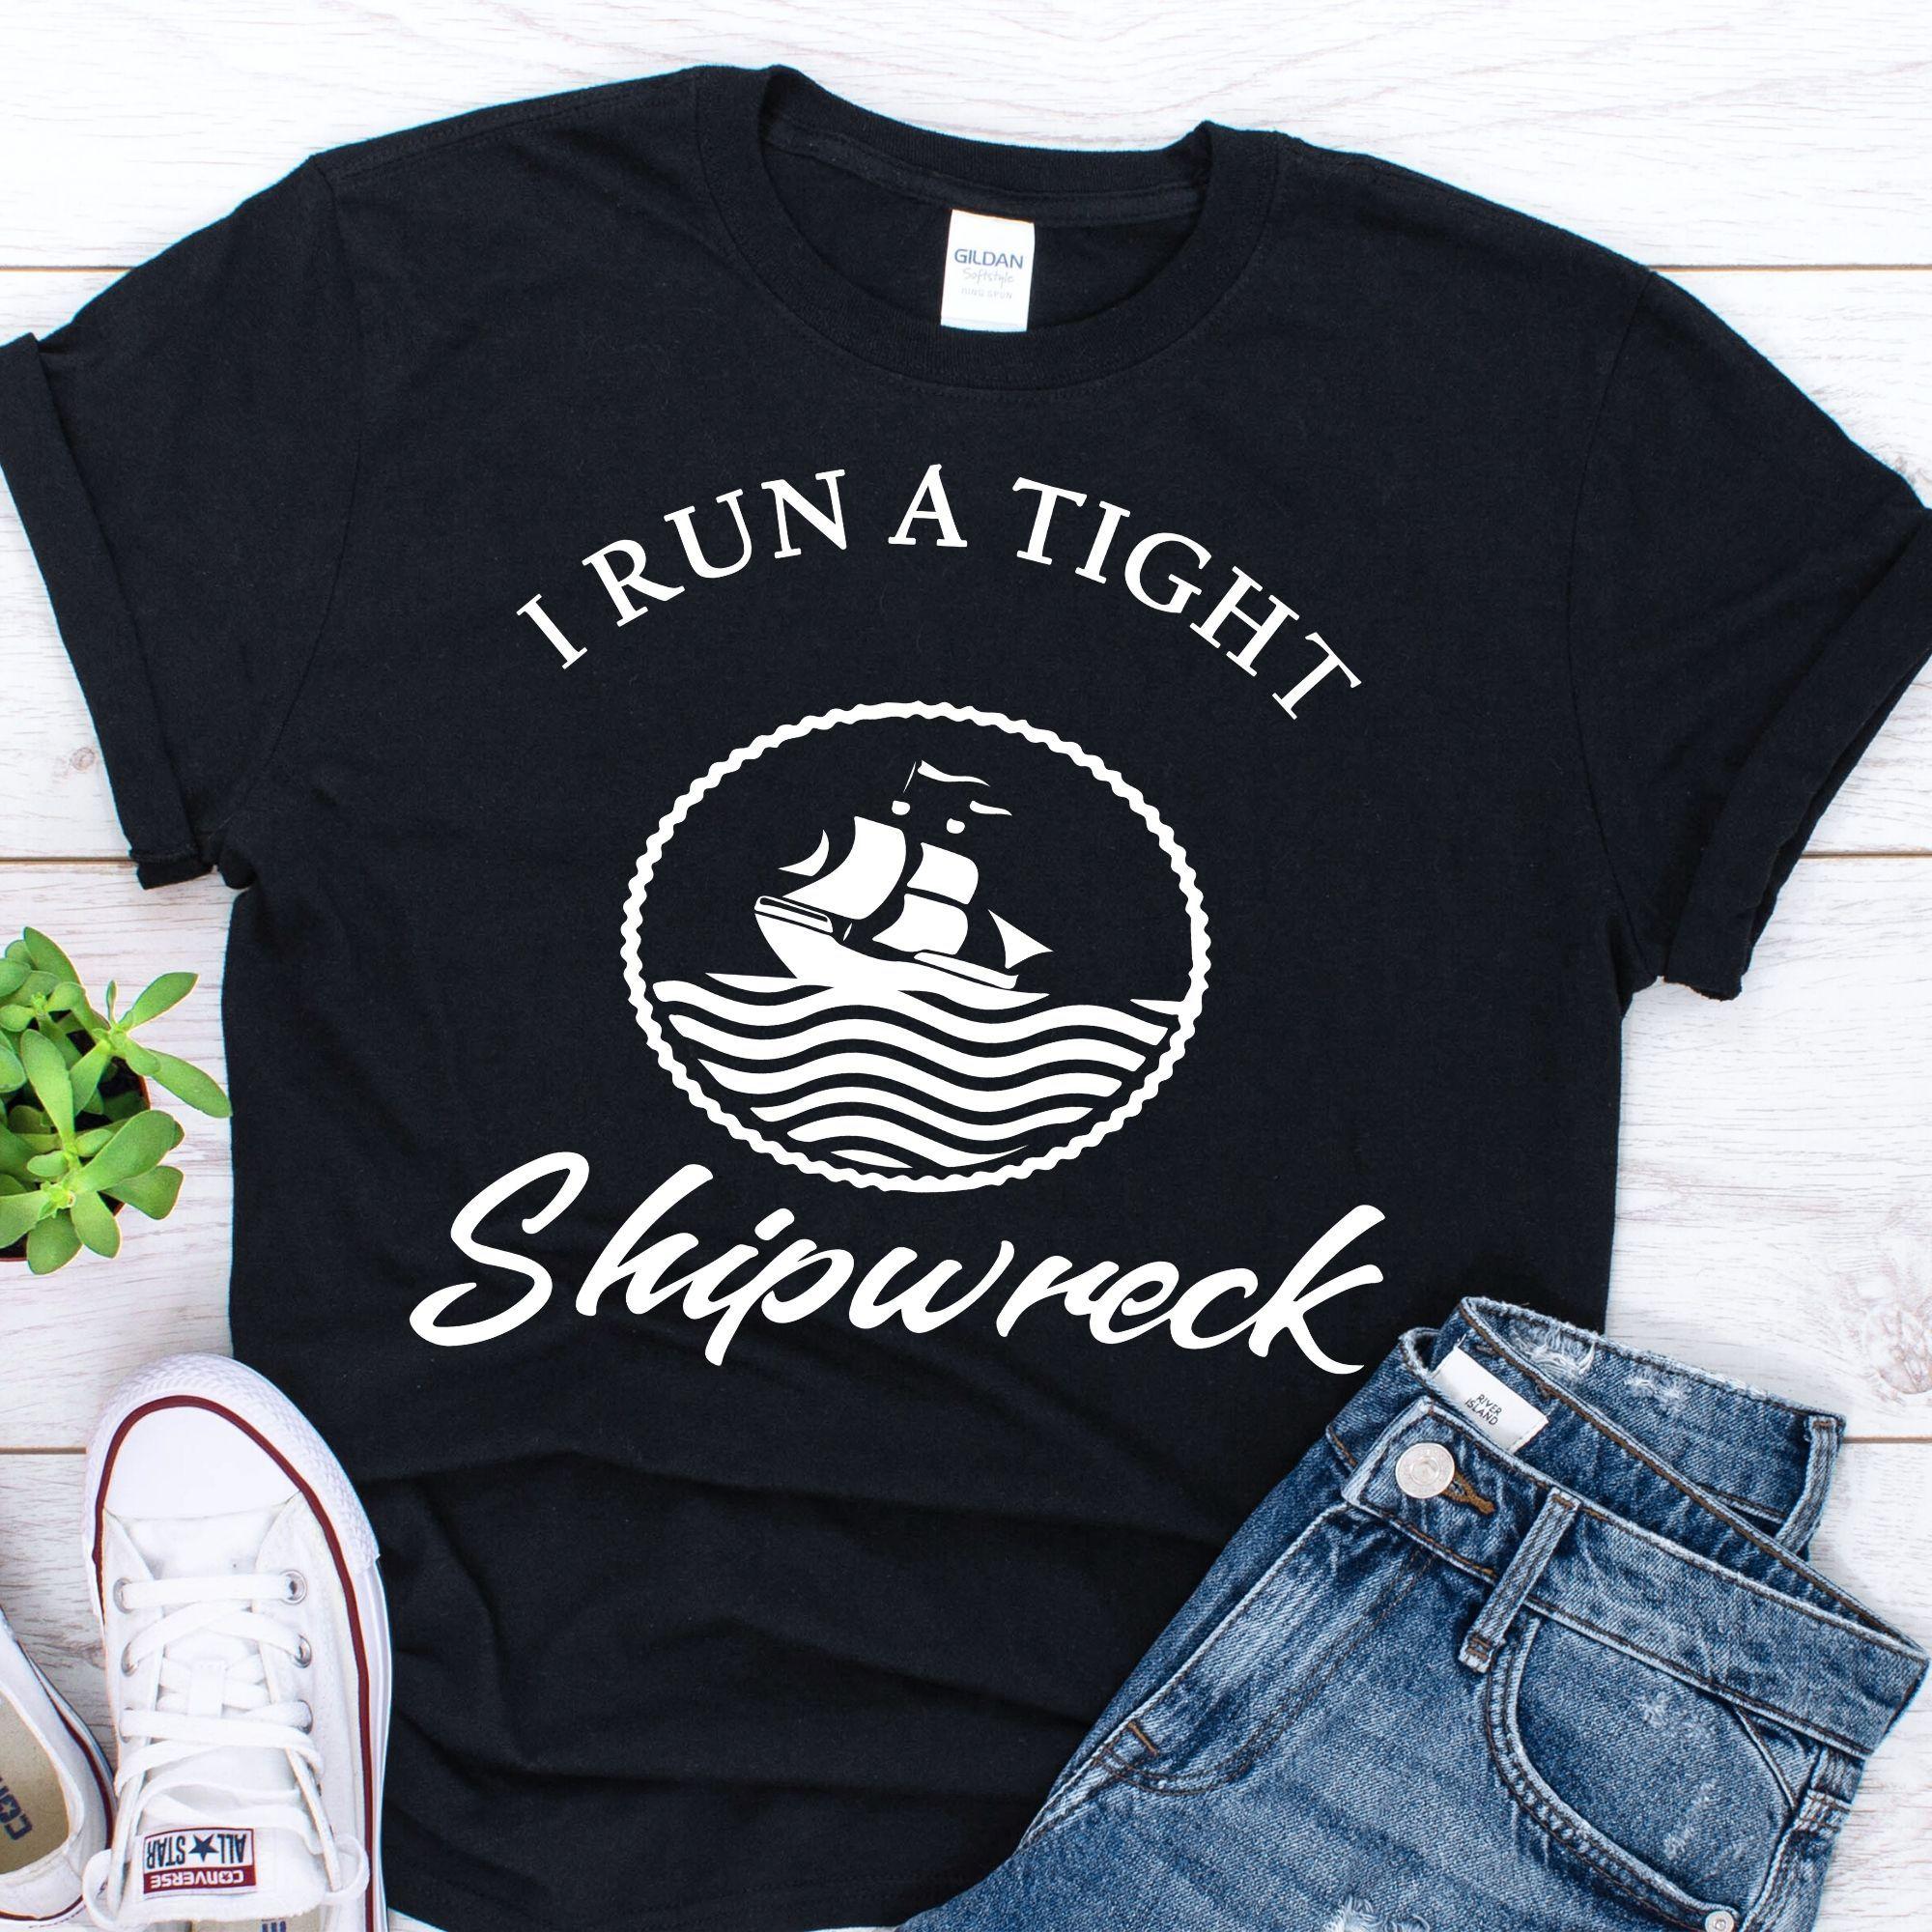 Park Art My WordPress Blog_I Run A Tight Shipwreck Shirt